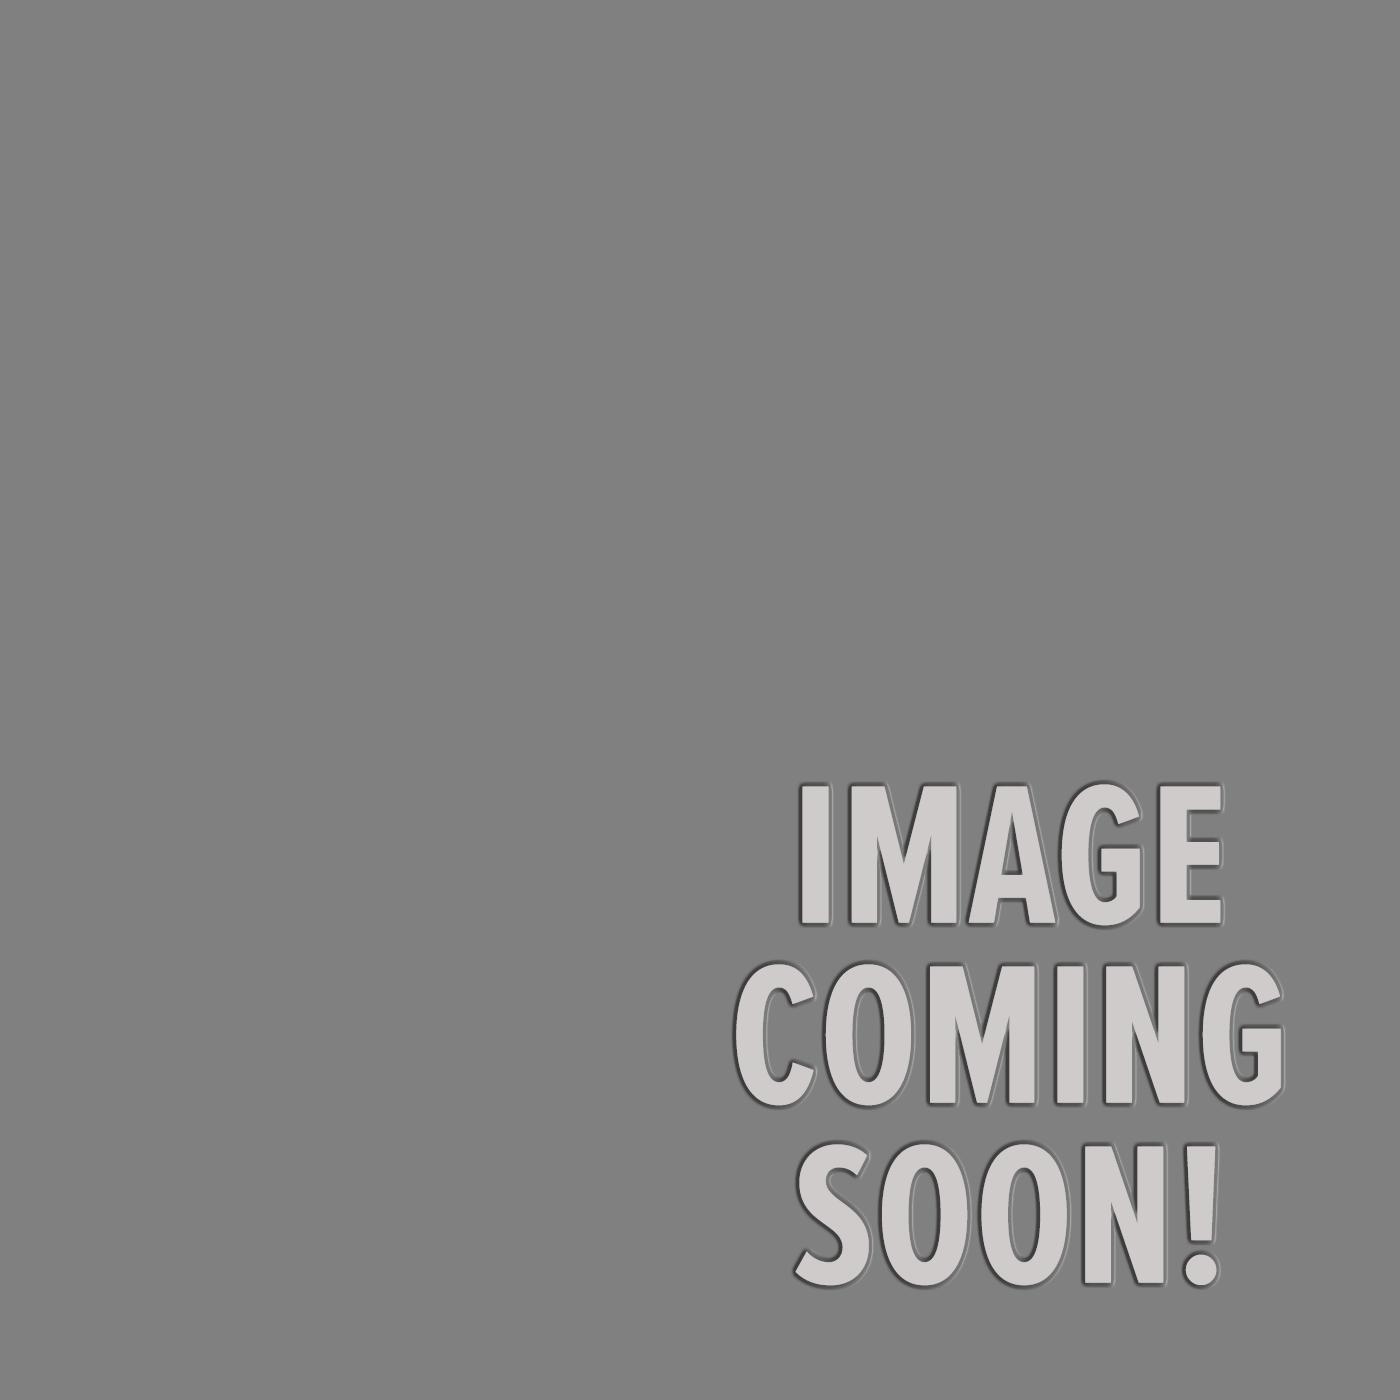 Ernie Ball 2214 Mammoth Slinky Electric Guitar Strings, 12-62